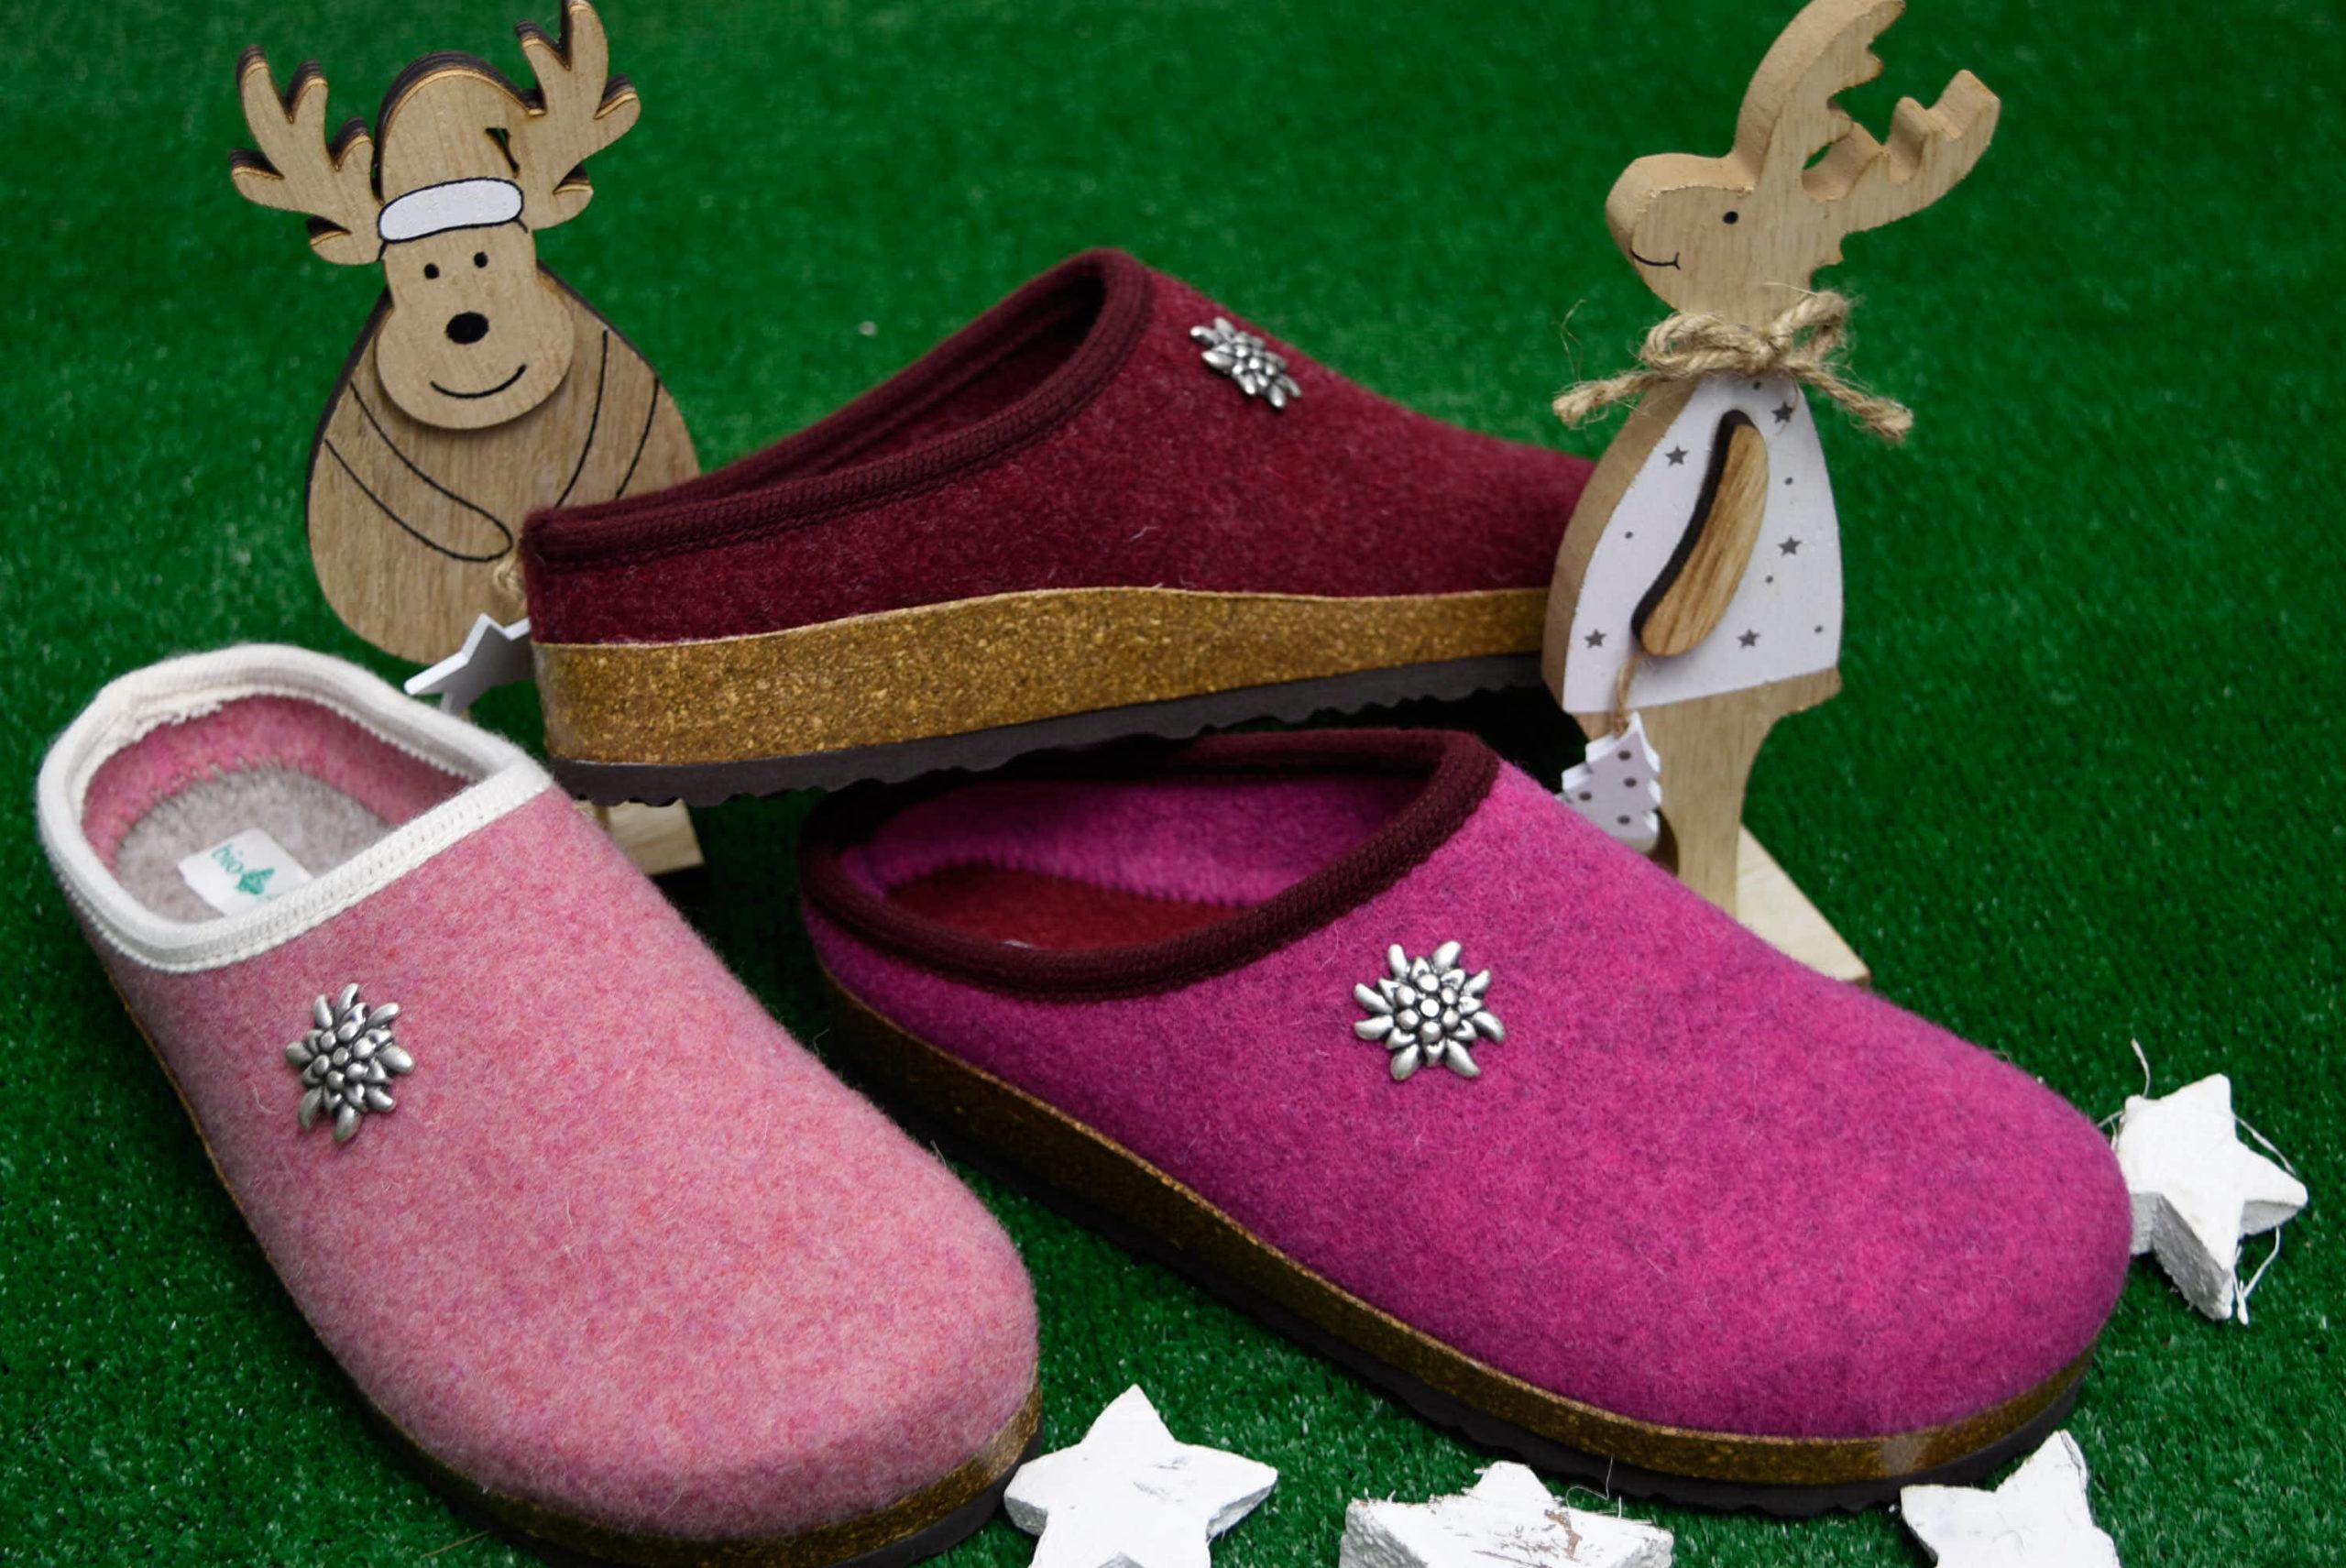 bio alpes 977 fior di pesco ciclamino bordo ciabatte natalizie da donna pantofole tirolesi calzature tradizionali altoatesine feltro lana cotta idea regalo